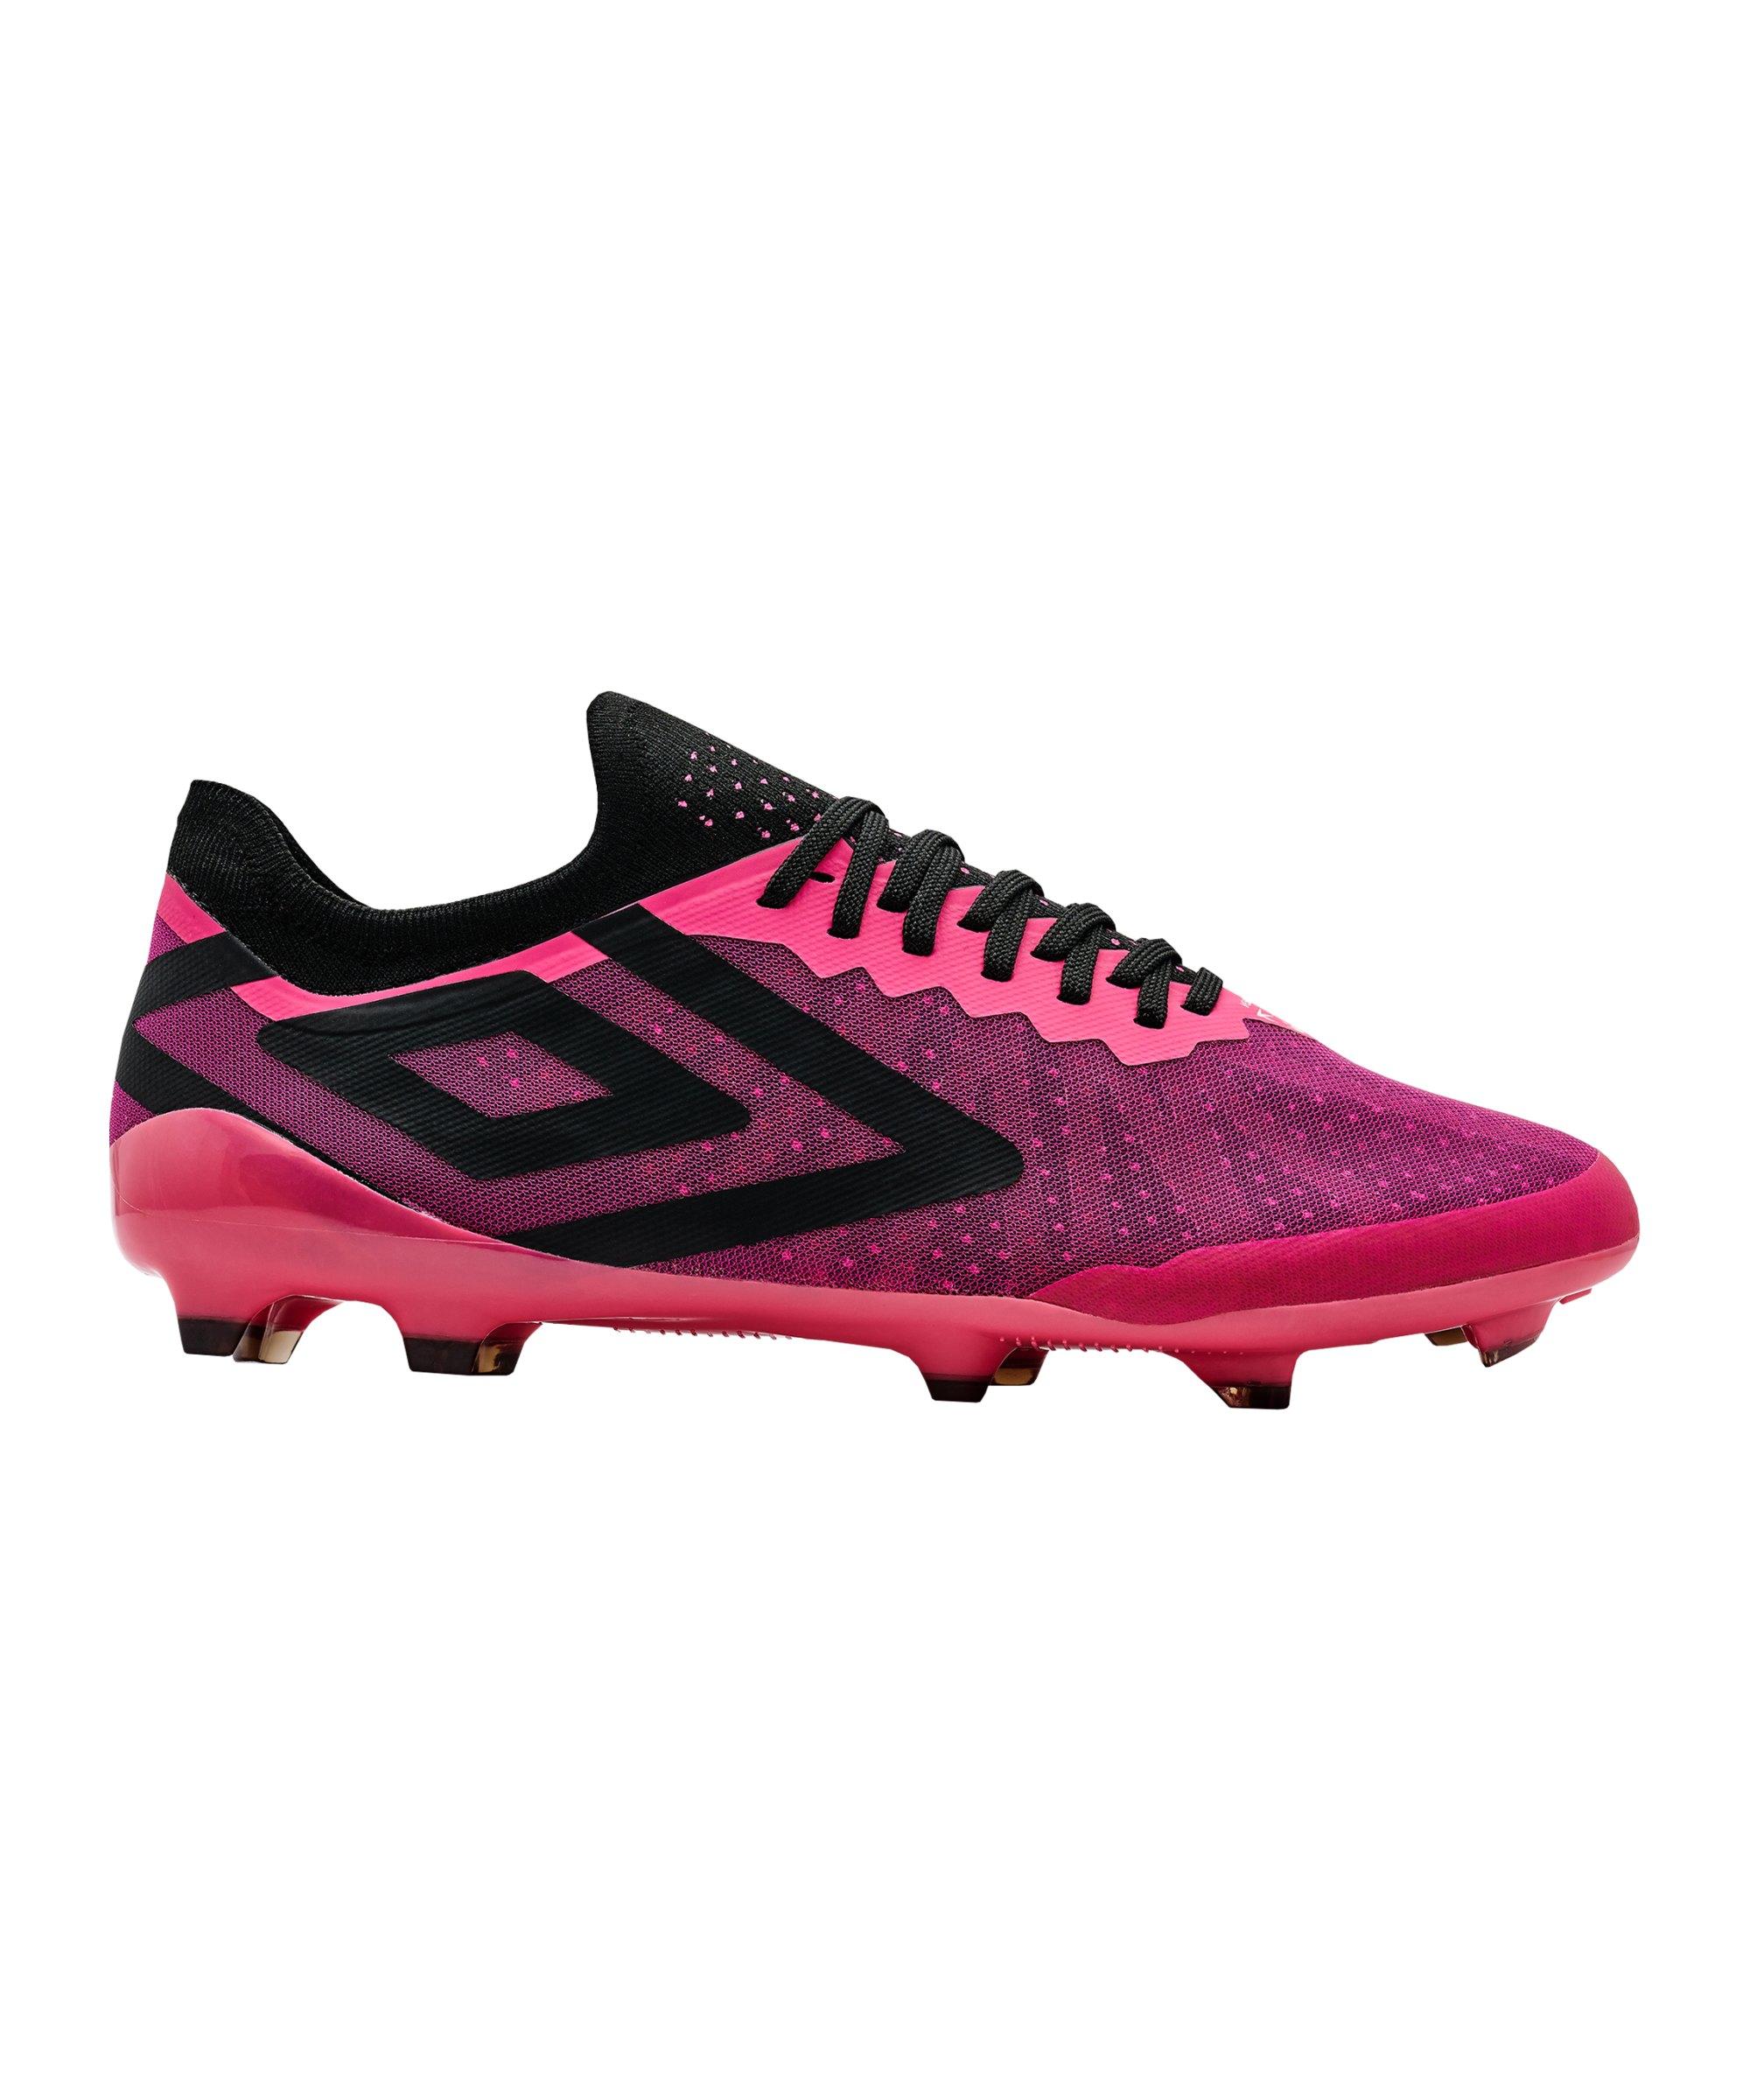 Umbro Velocita VI Pro FG Pink Schwarz FKDR - pink